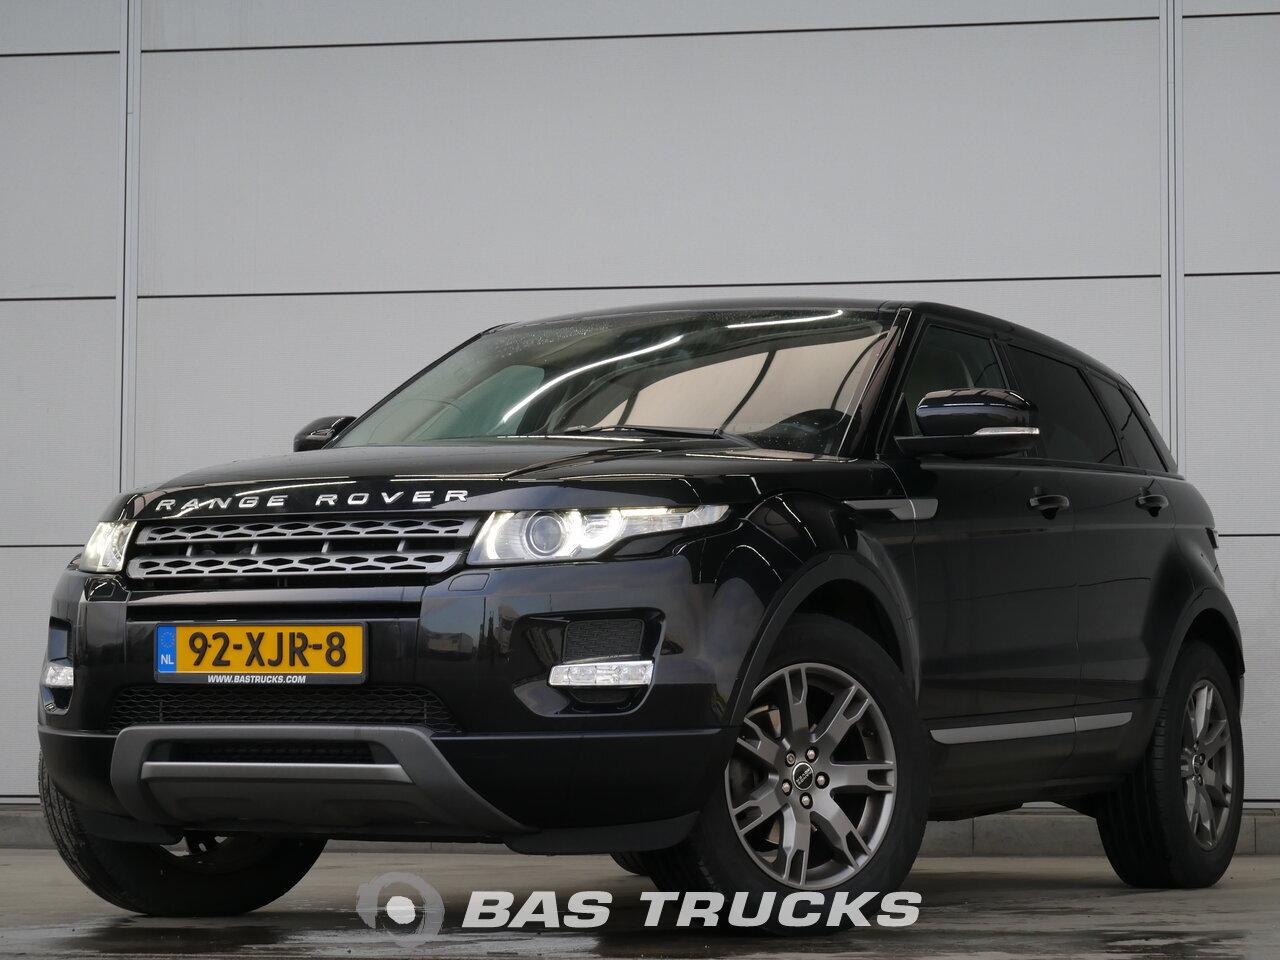 https://www.bastrucks.com/photos/1280/Used-Car-Land-Rover-Range-Rover-Evoque-22-TD4-4WD-2011_130172_1.jpg?04102017